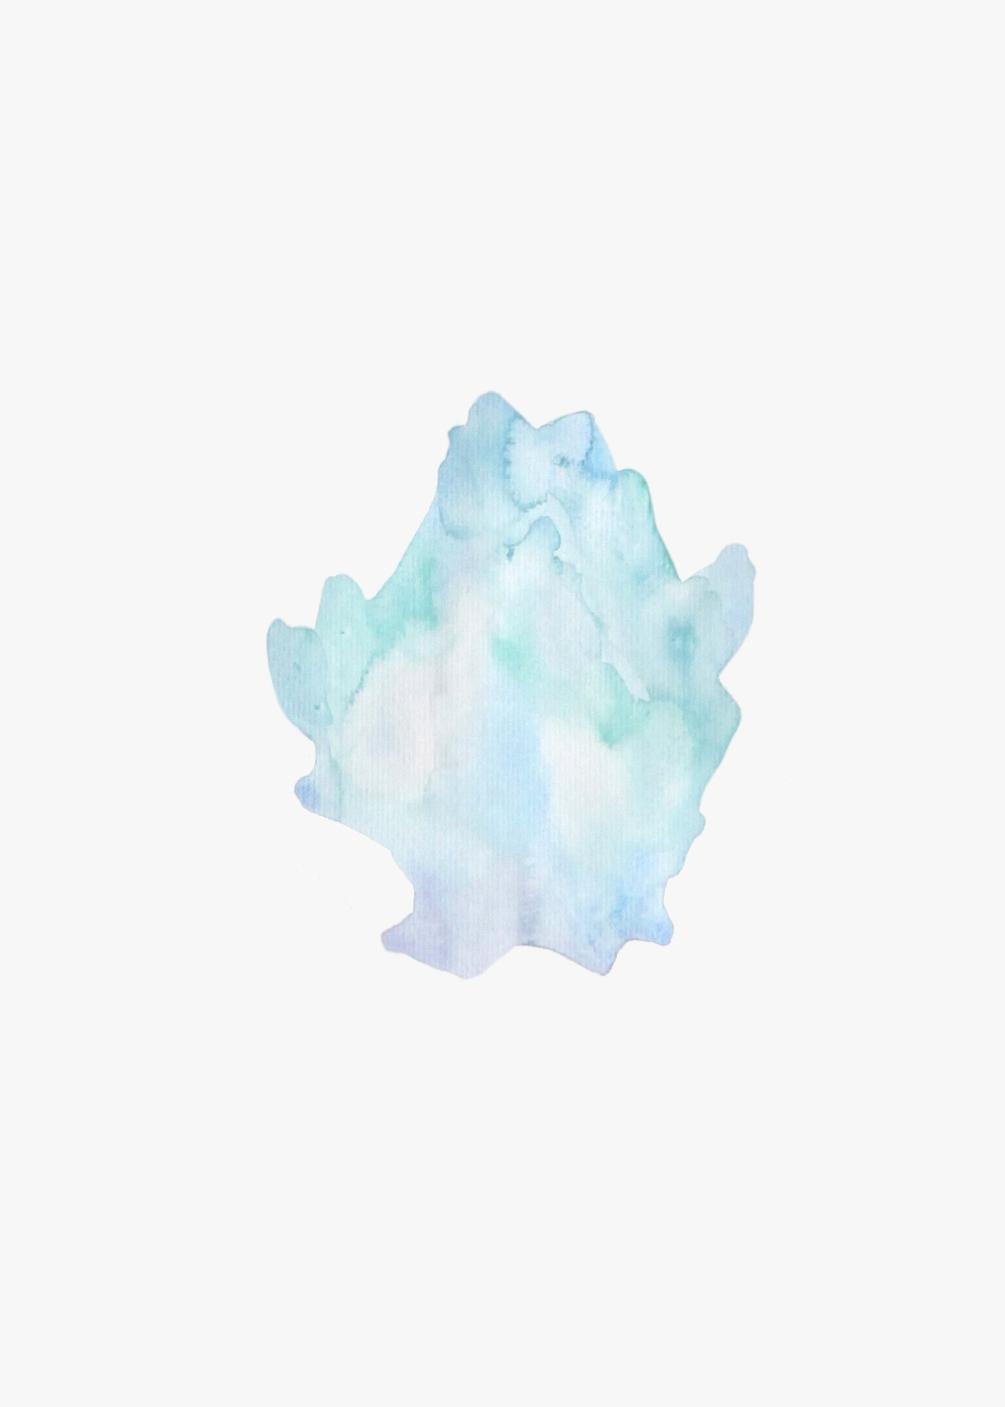 Organisme bleu clair  , 2016, watercolor on paper, 40x30cm